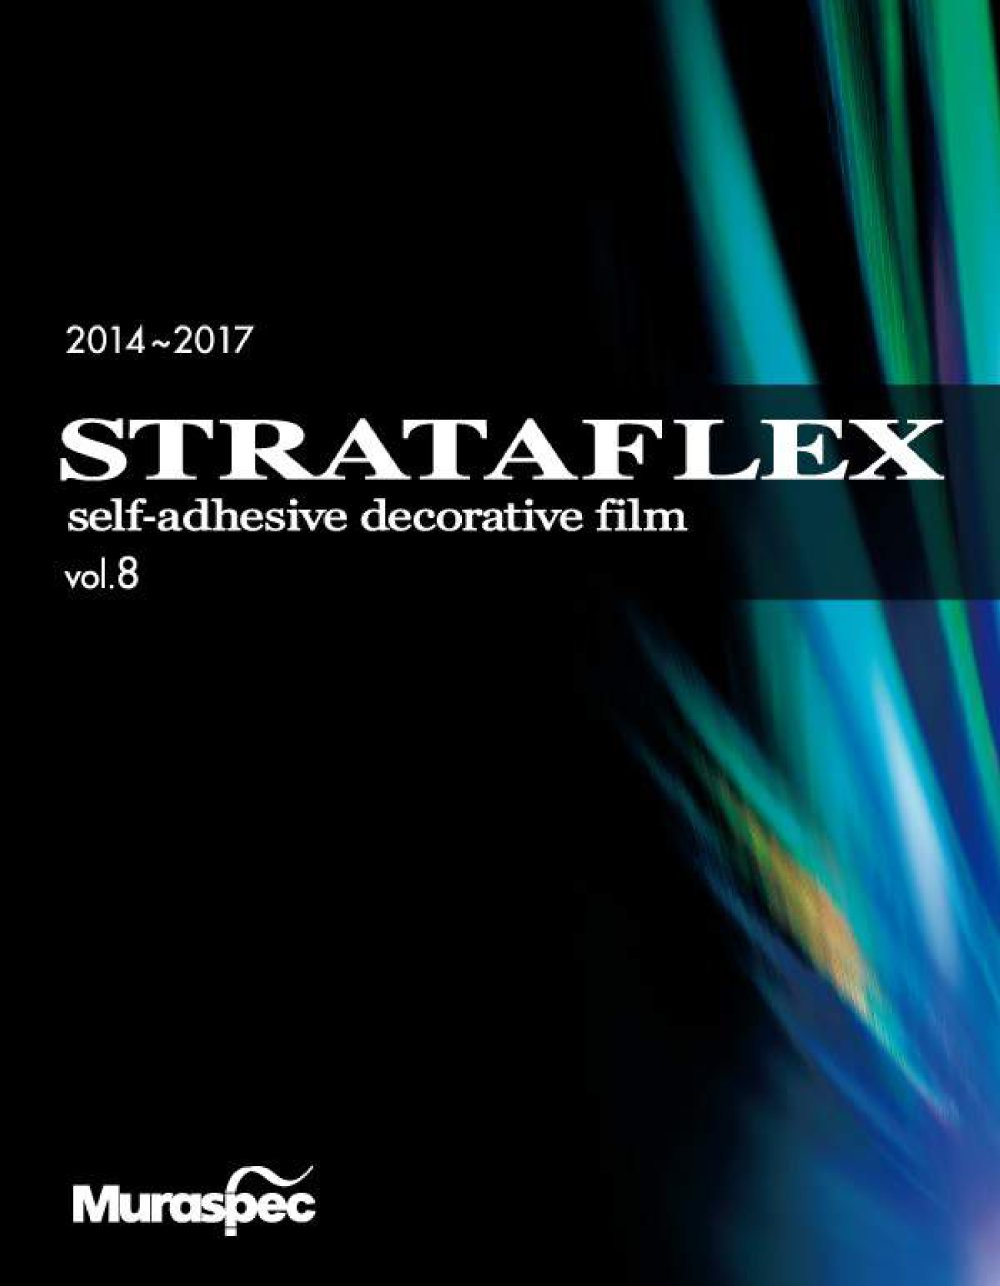 strataflex